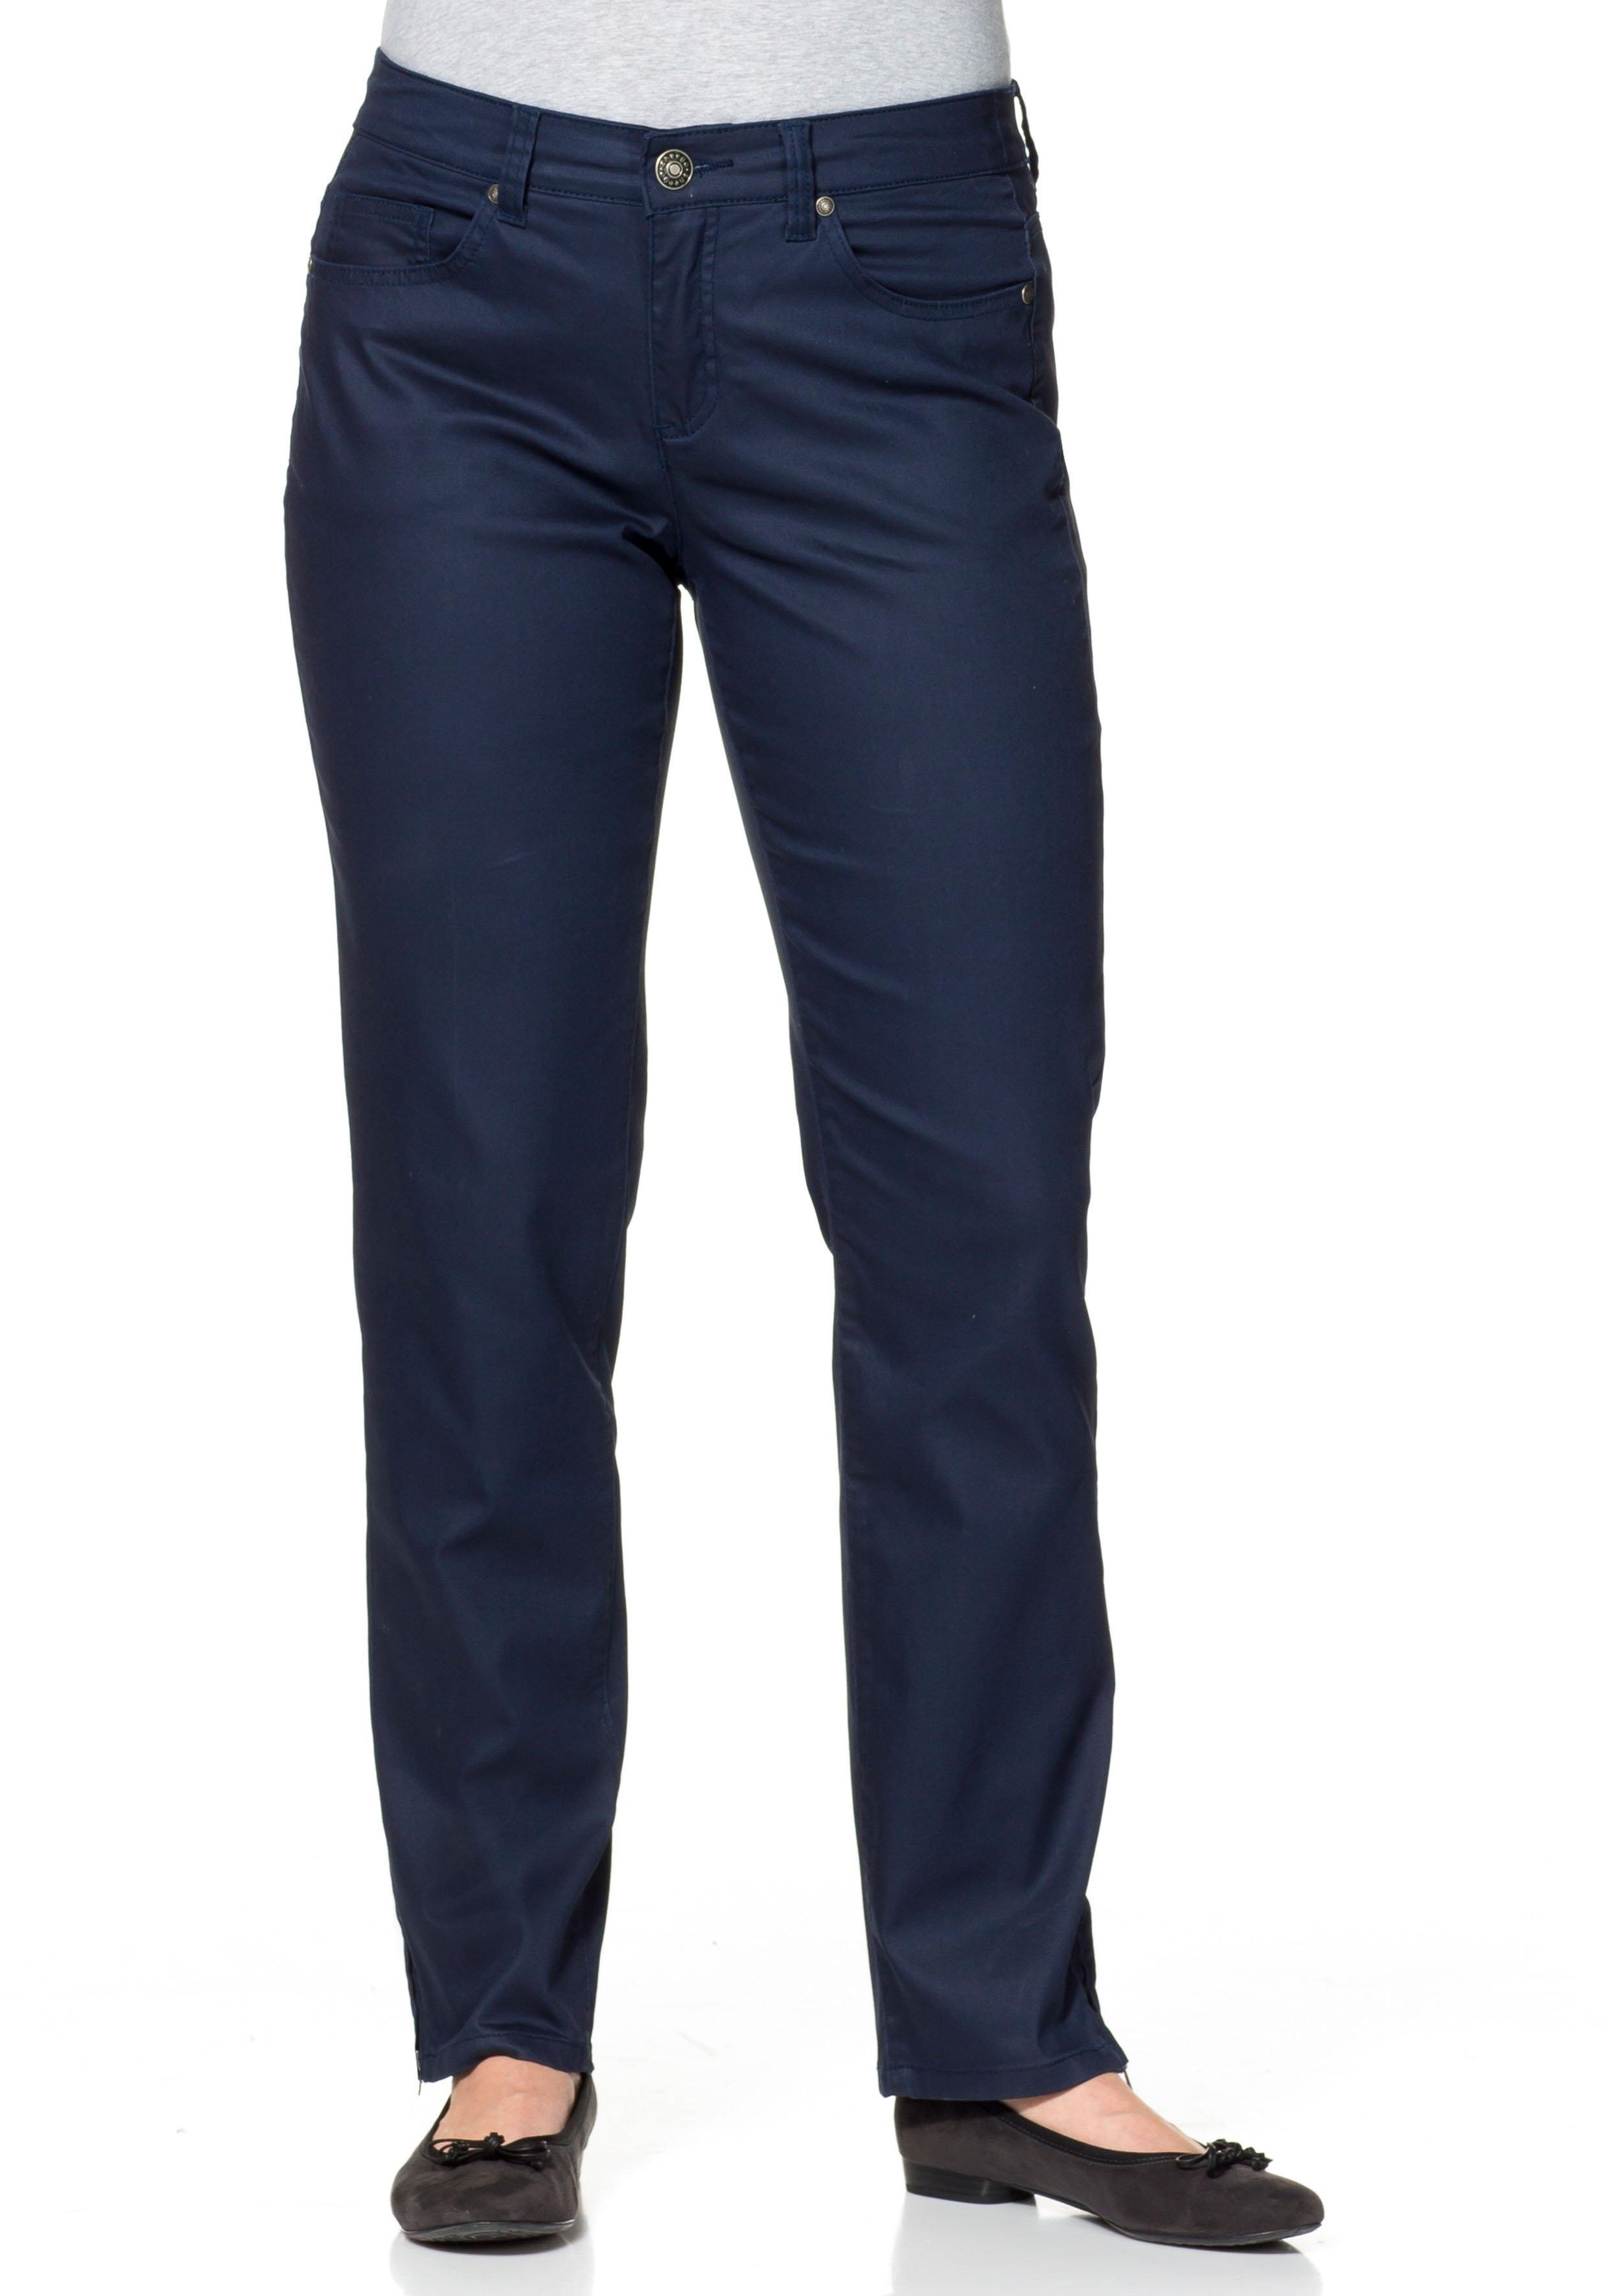 Sheego Casual SHEEGO CASUAL smalle stretchbroek in five-pocketsmodel nu online kopen bij OTTO